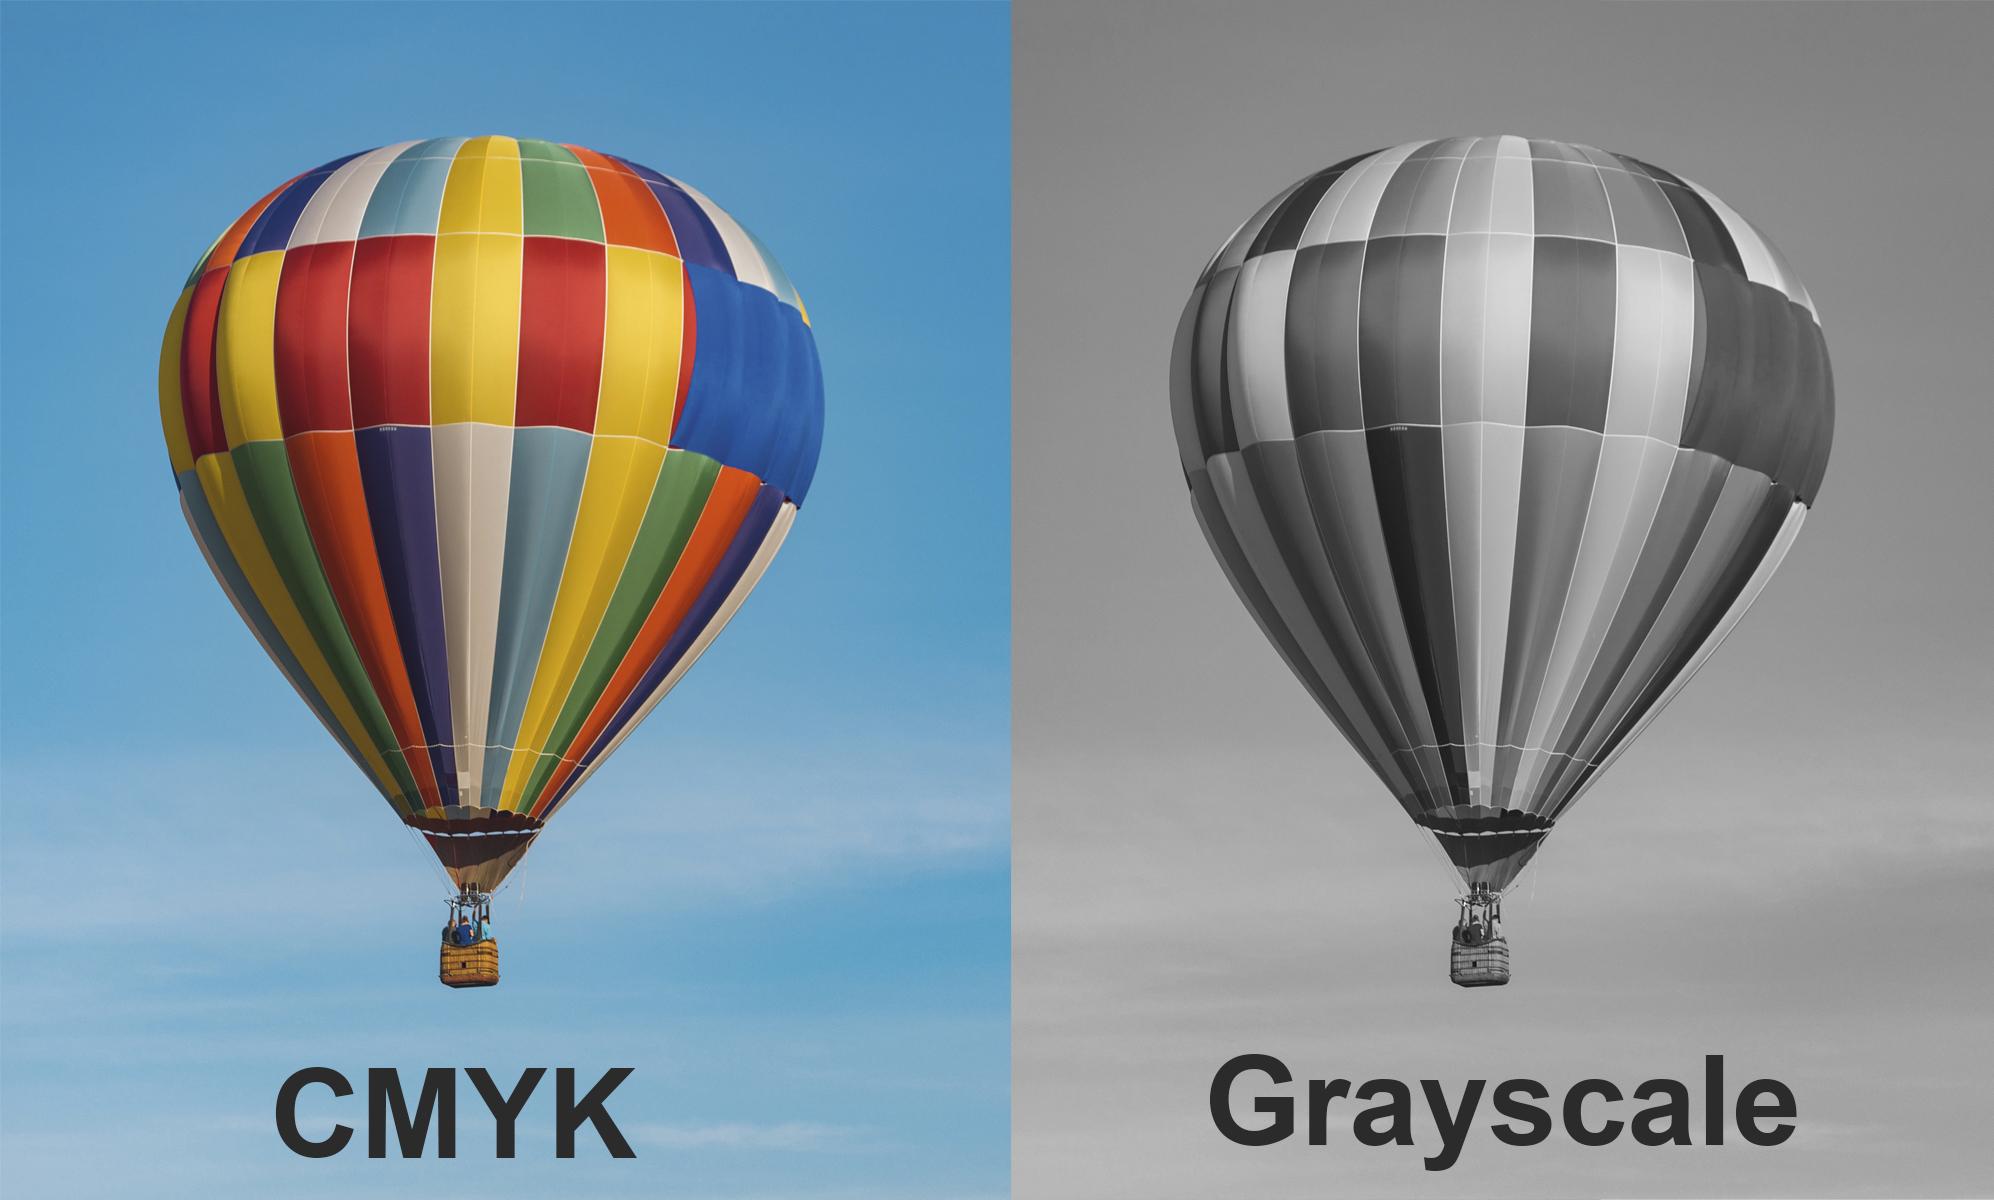 CMYK vs Grayscale